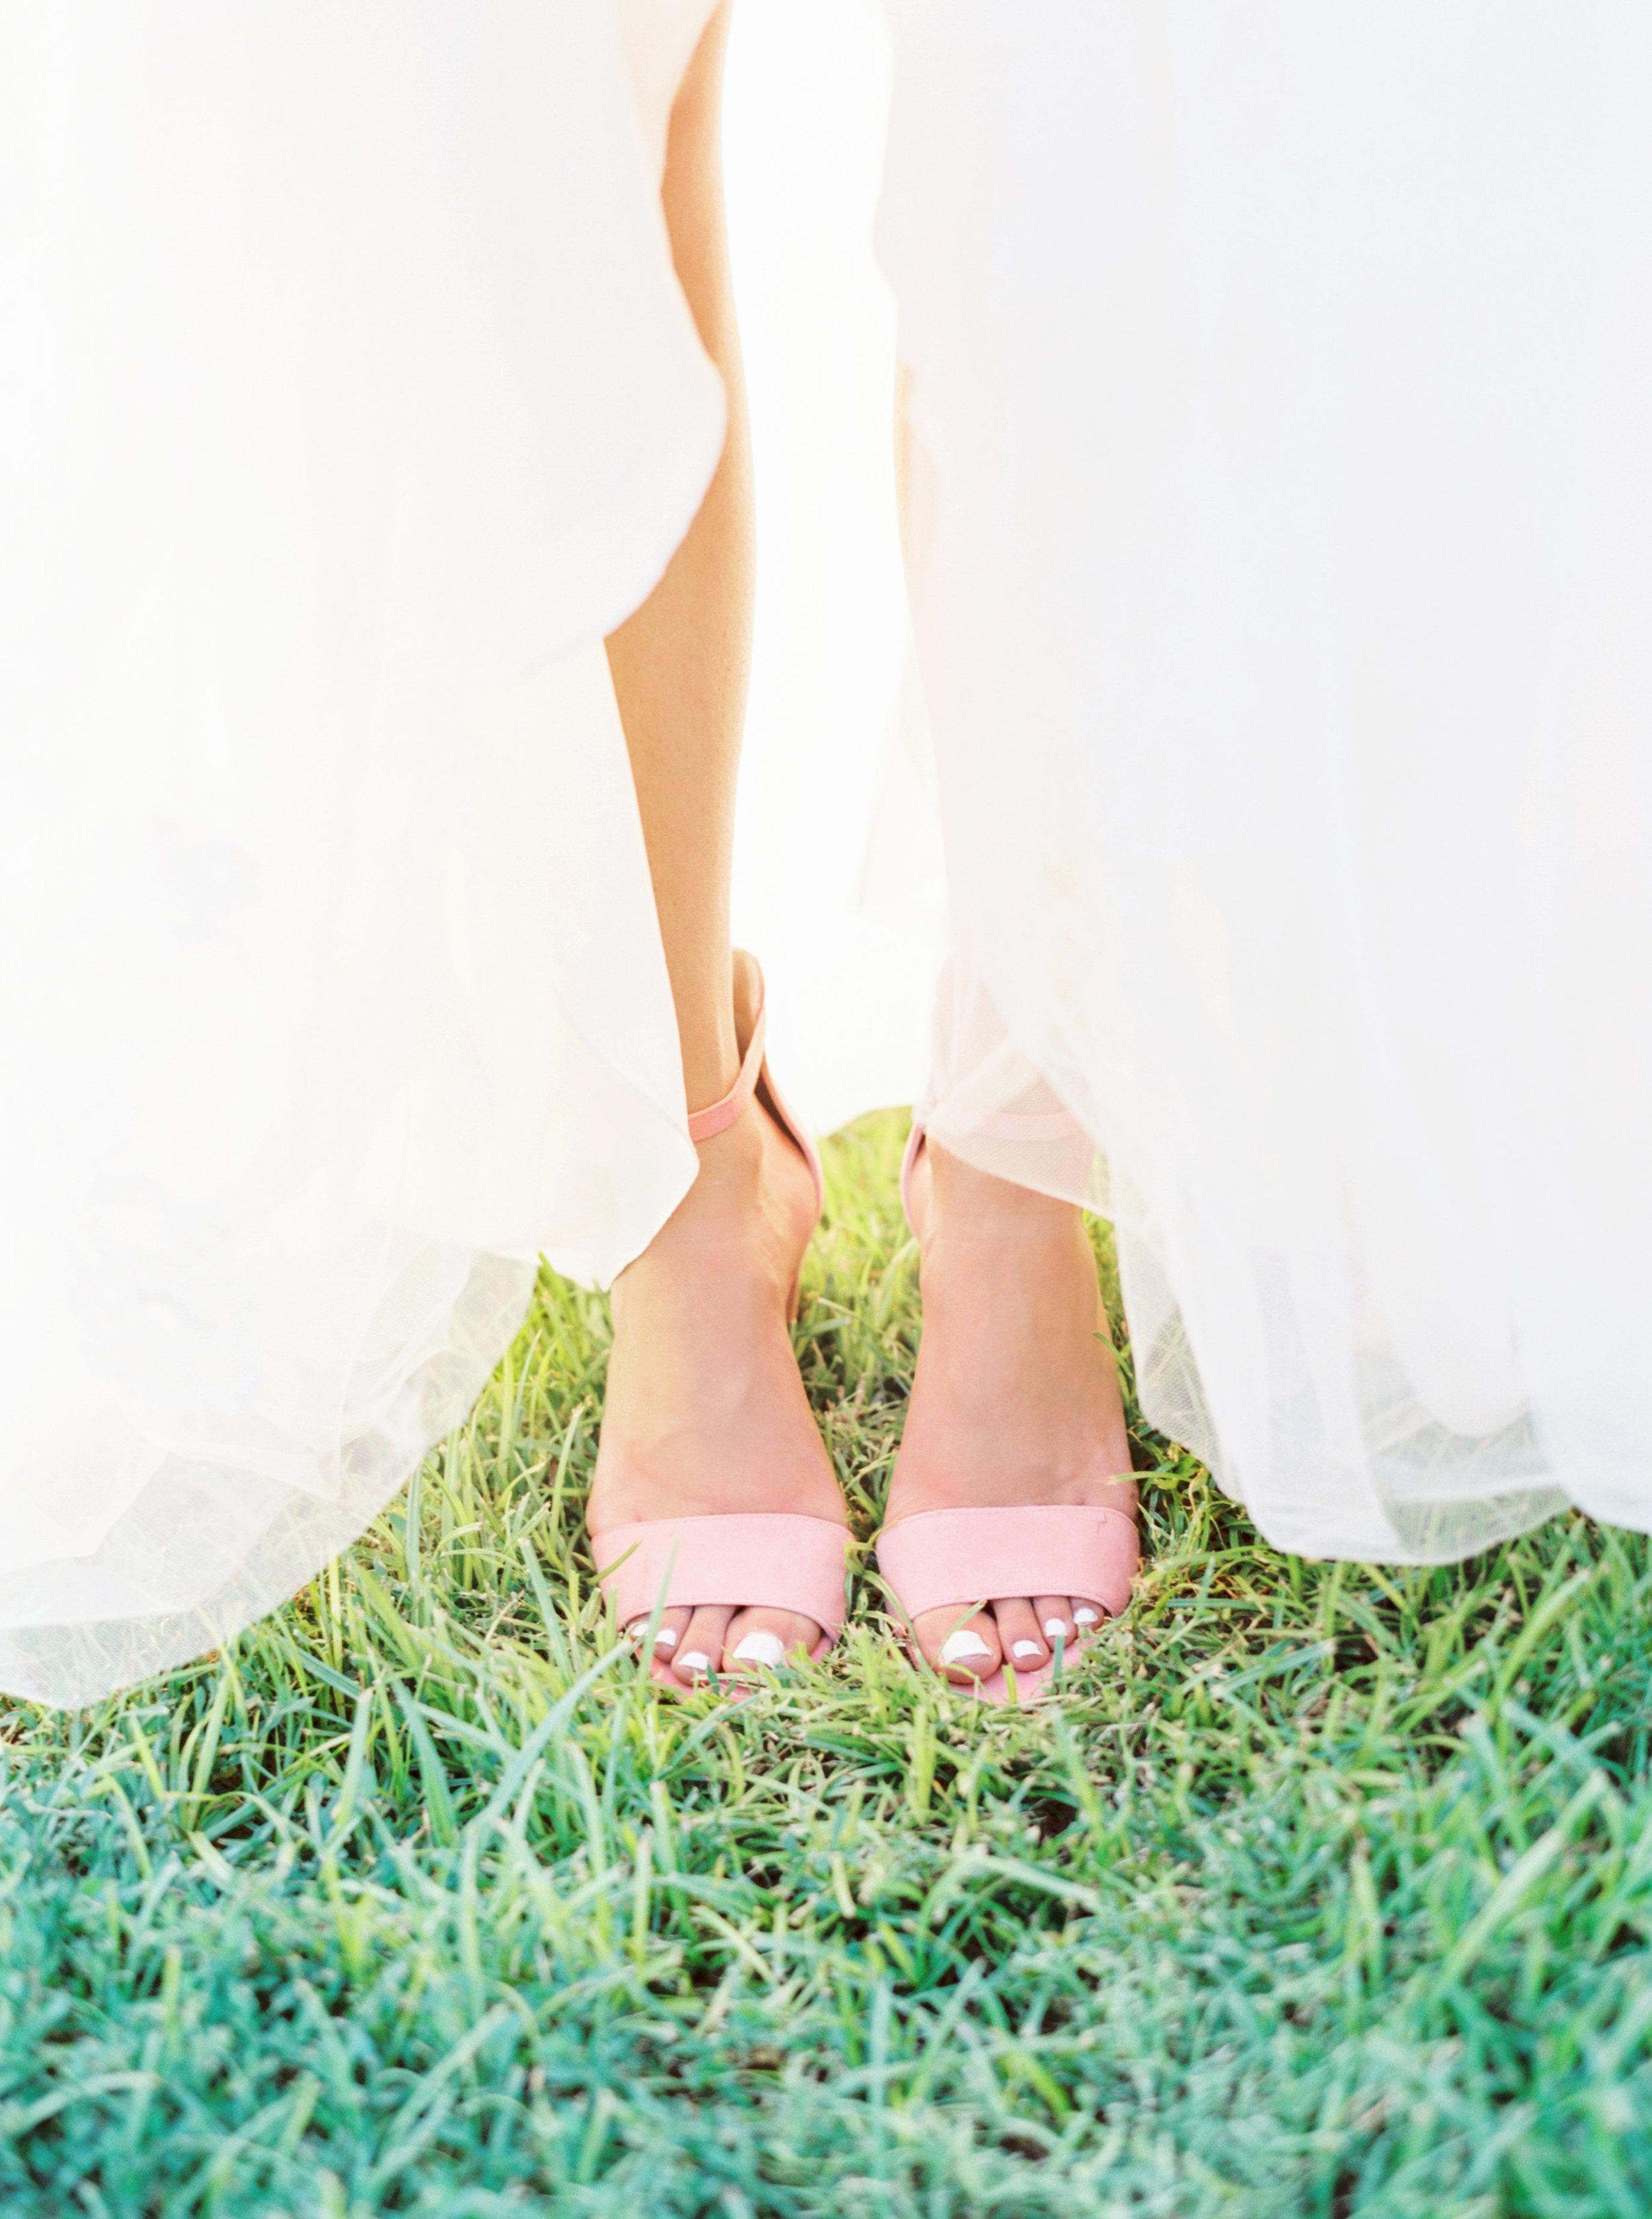 Colorful Brunch Wedding Styled Shoot featured on Style Me Pretty: Konsider It Done- AZ Arizona Wedding & Event Planner, Designer, Coordinator Planning in Scottsdale, Phoenix, Paradise Valley, Tempe, Gilbert, Mesa, Chandler, Tucson, Sedona